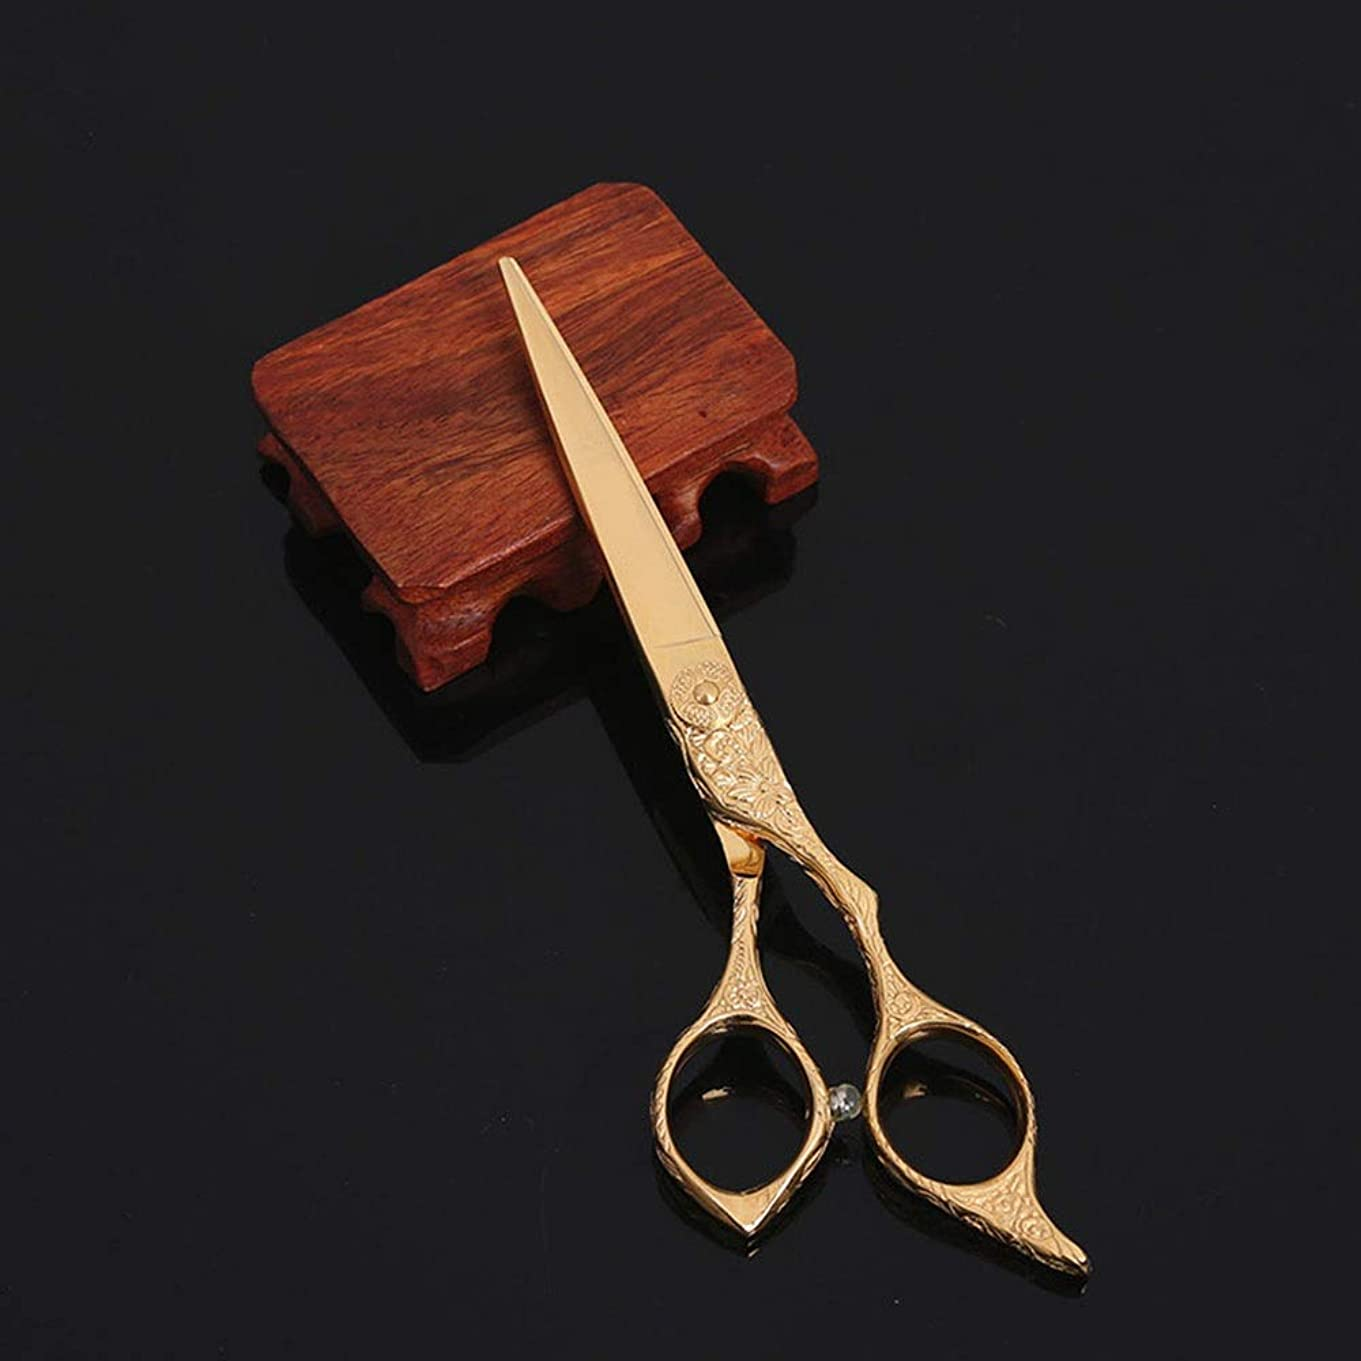 Hairdressing 6インチゴールド塗装ハイエンド理髪はさみ、プロの美容院はさみヘアカットはさみステンレス理髪はさみ (色 : ゴールド)